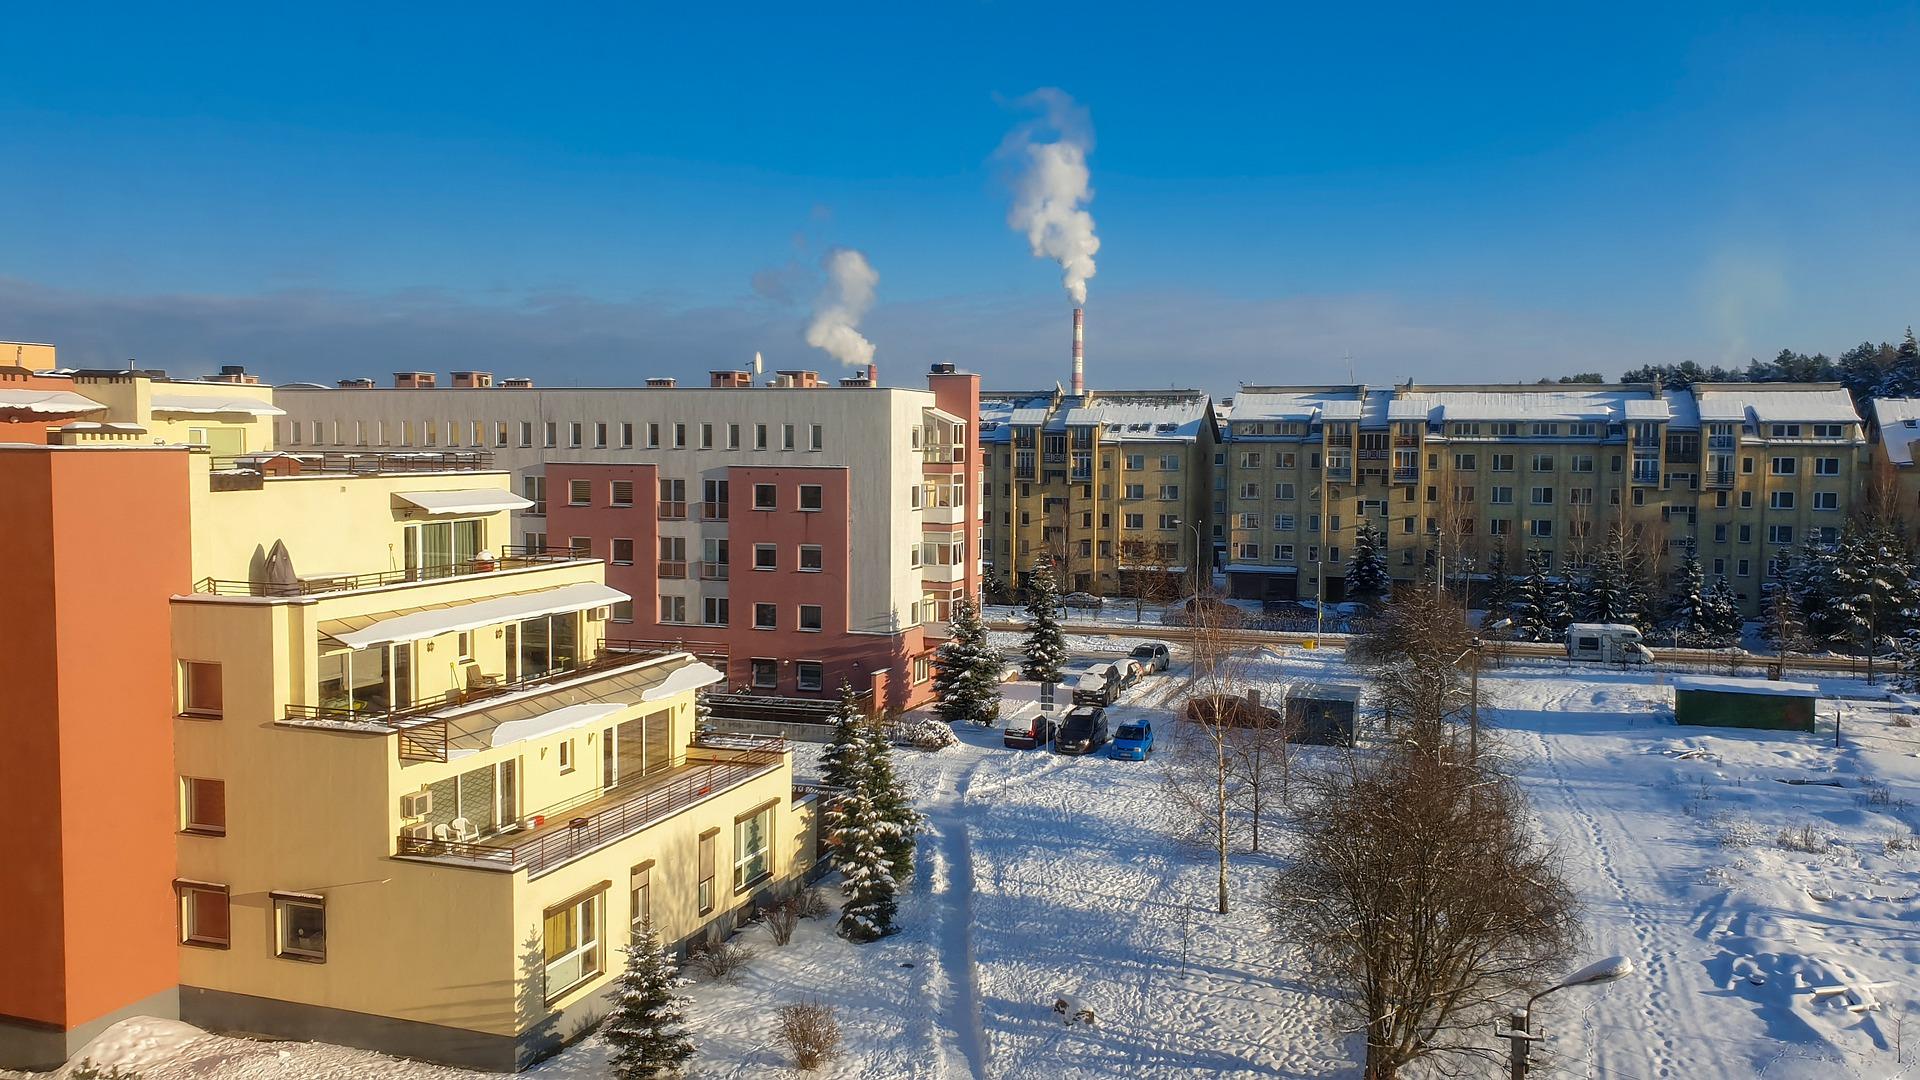 https://www.advanticsys.com/wp-content/uploads/2020/10/Lithuania_DH_Buildings-1.jpg